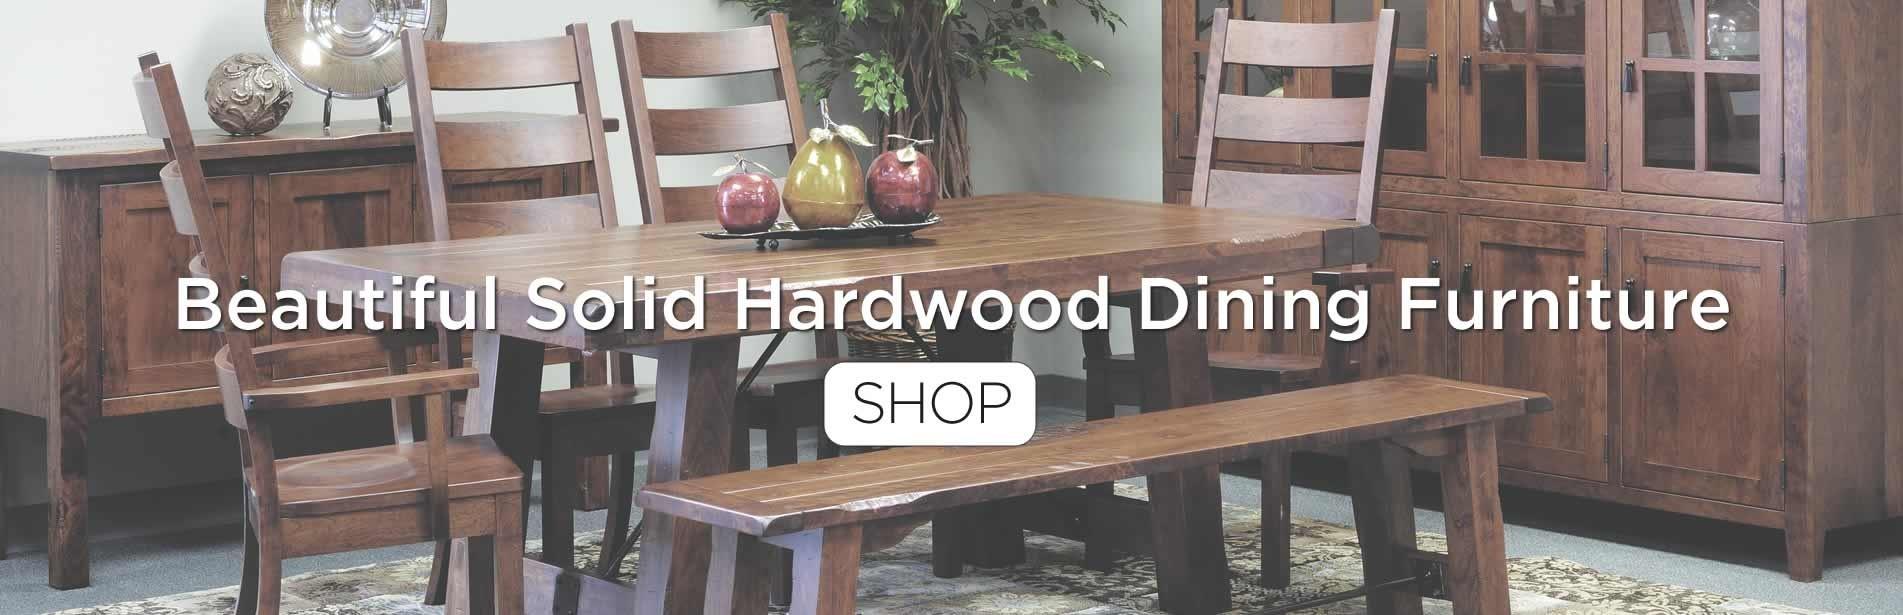 Custom crafted solid hardwood dining furniture